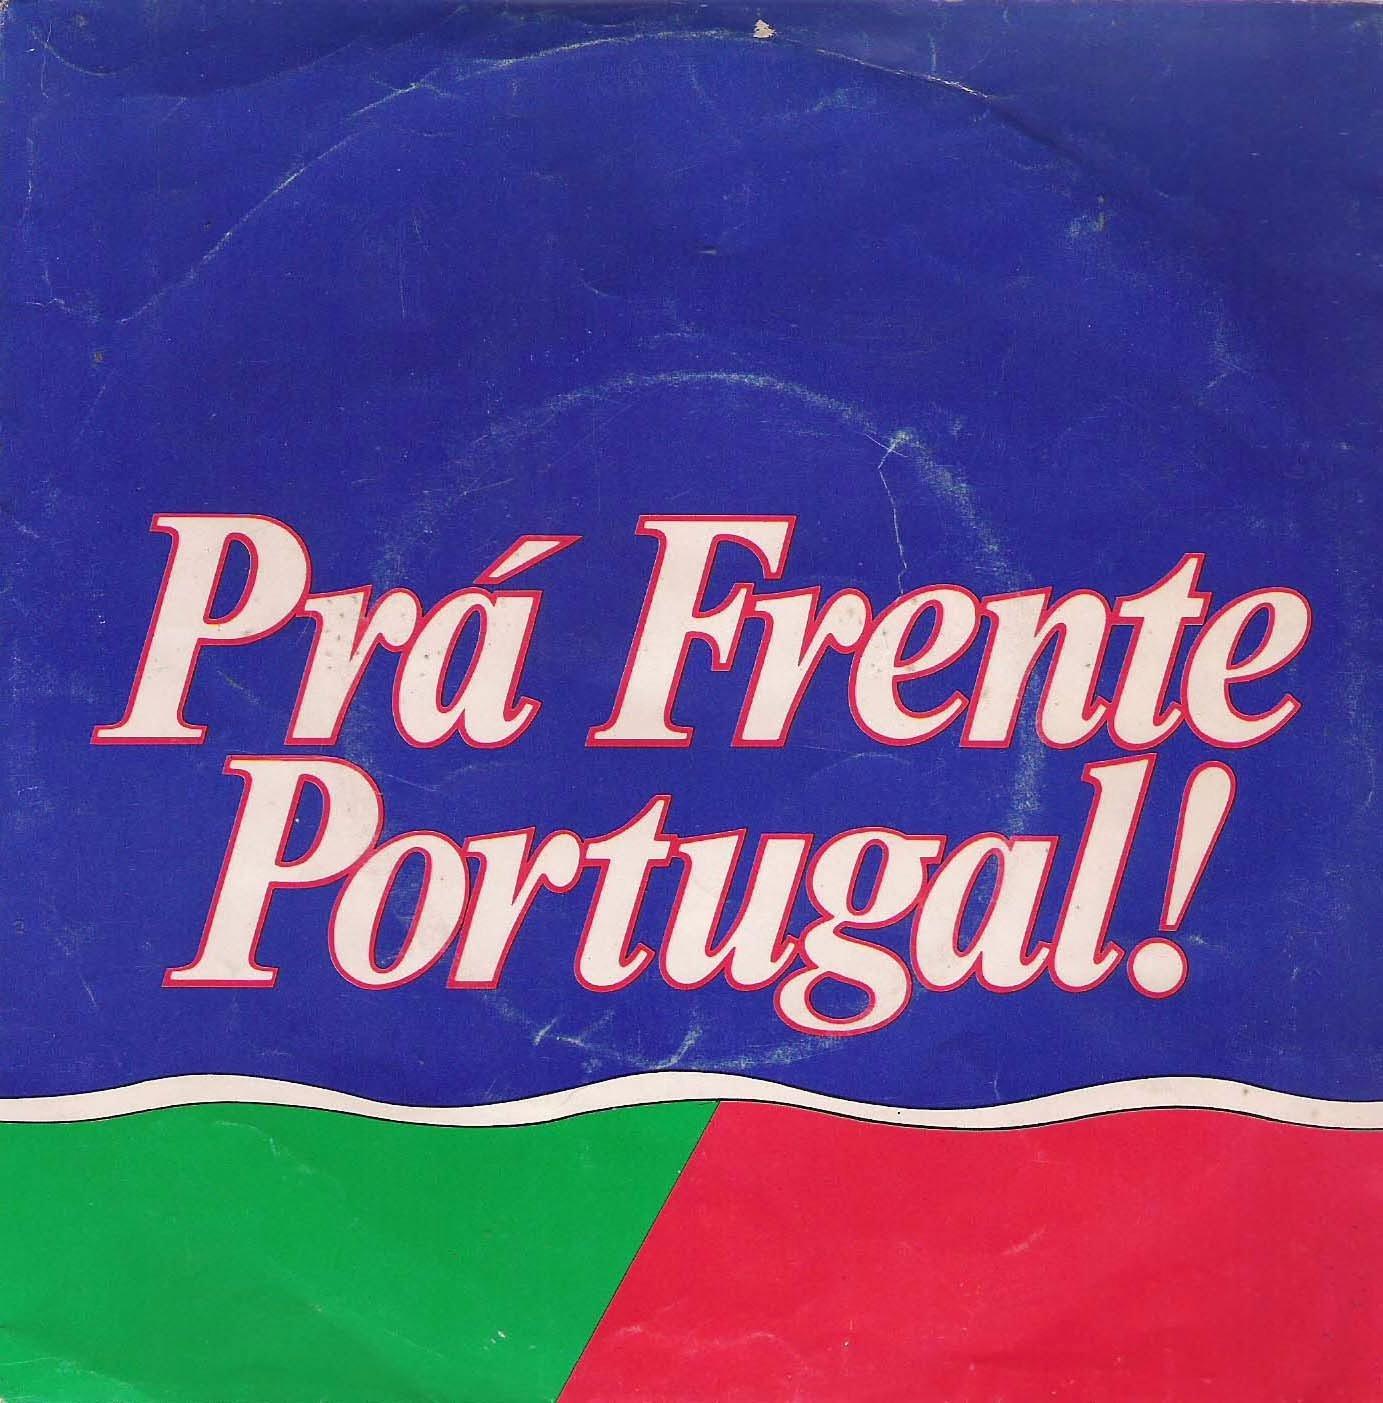 PráFrentePortugal